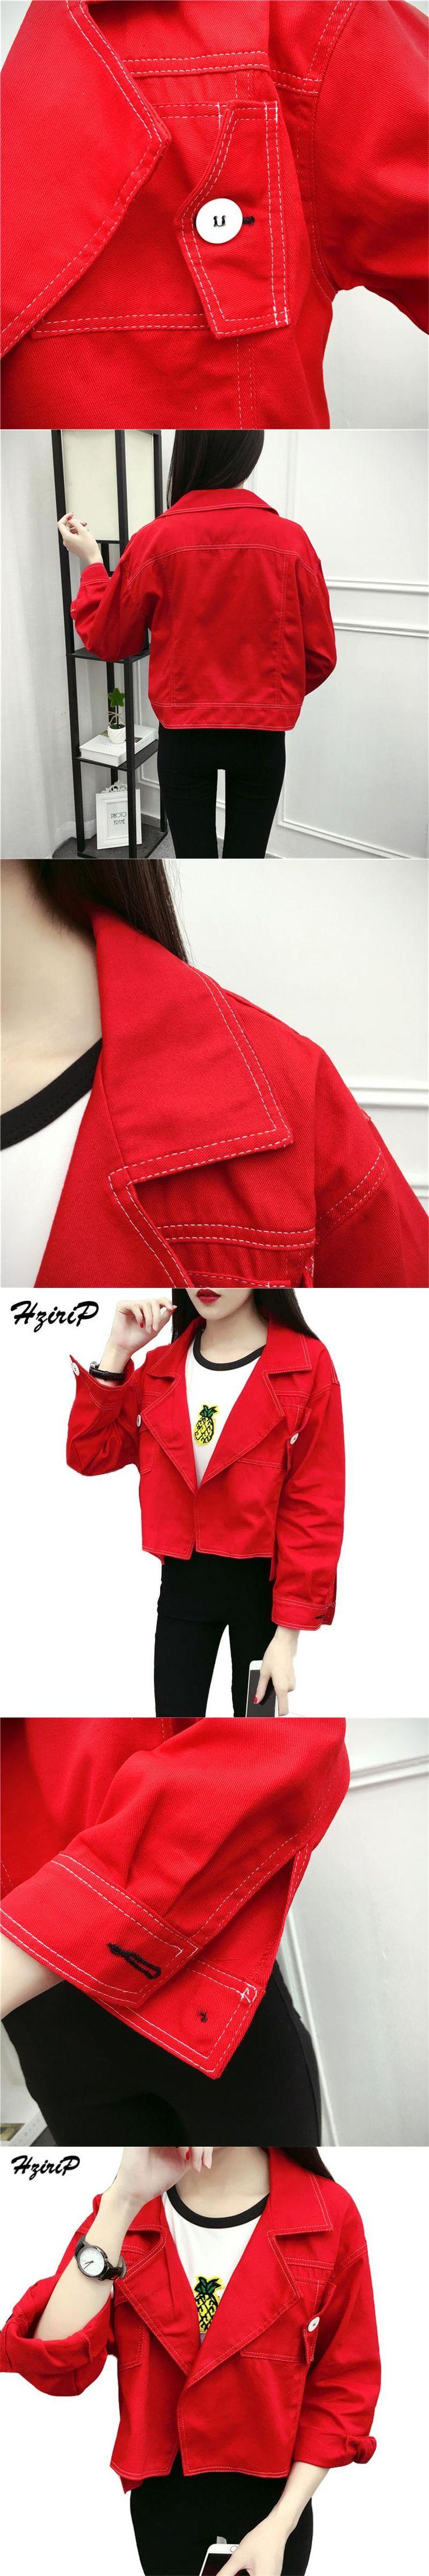 Hzirip Jacket Women Short Jeans Overcoat Ladies Jackets Tops Turn Down Collar Slim Red Denim Cardigan Top For Women High Quality